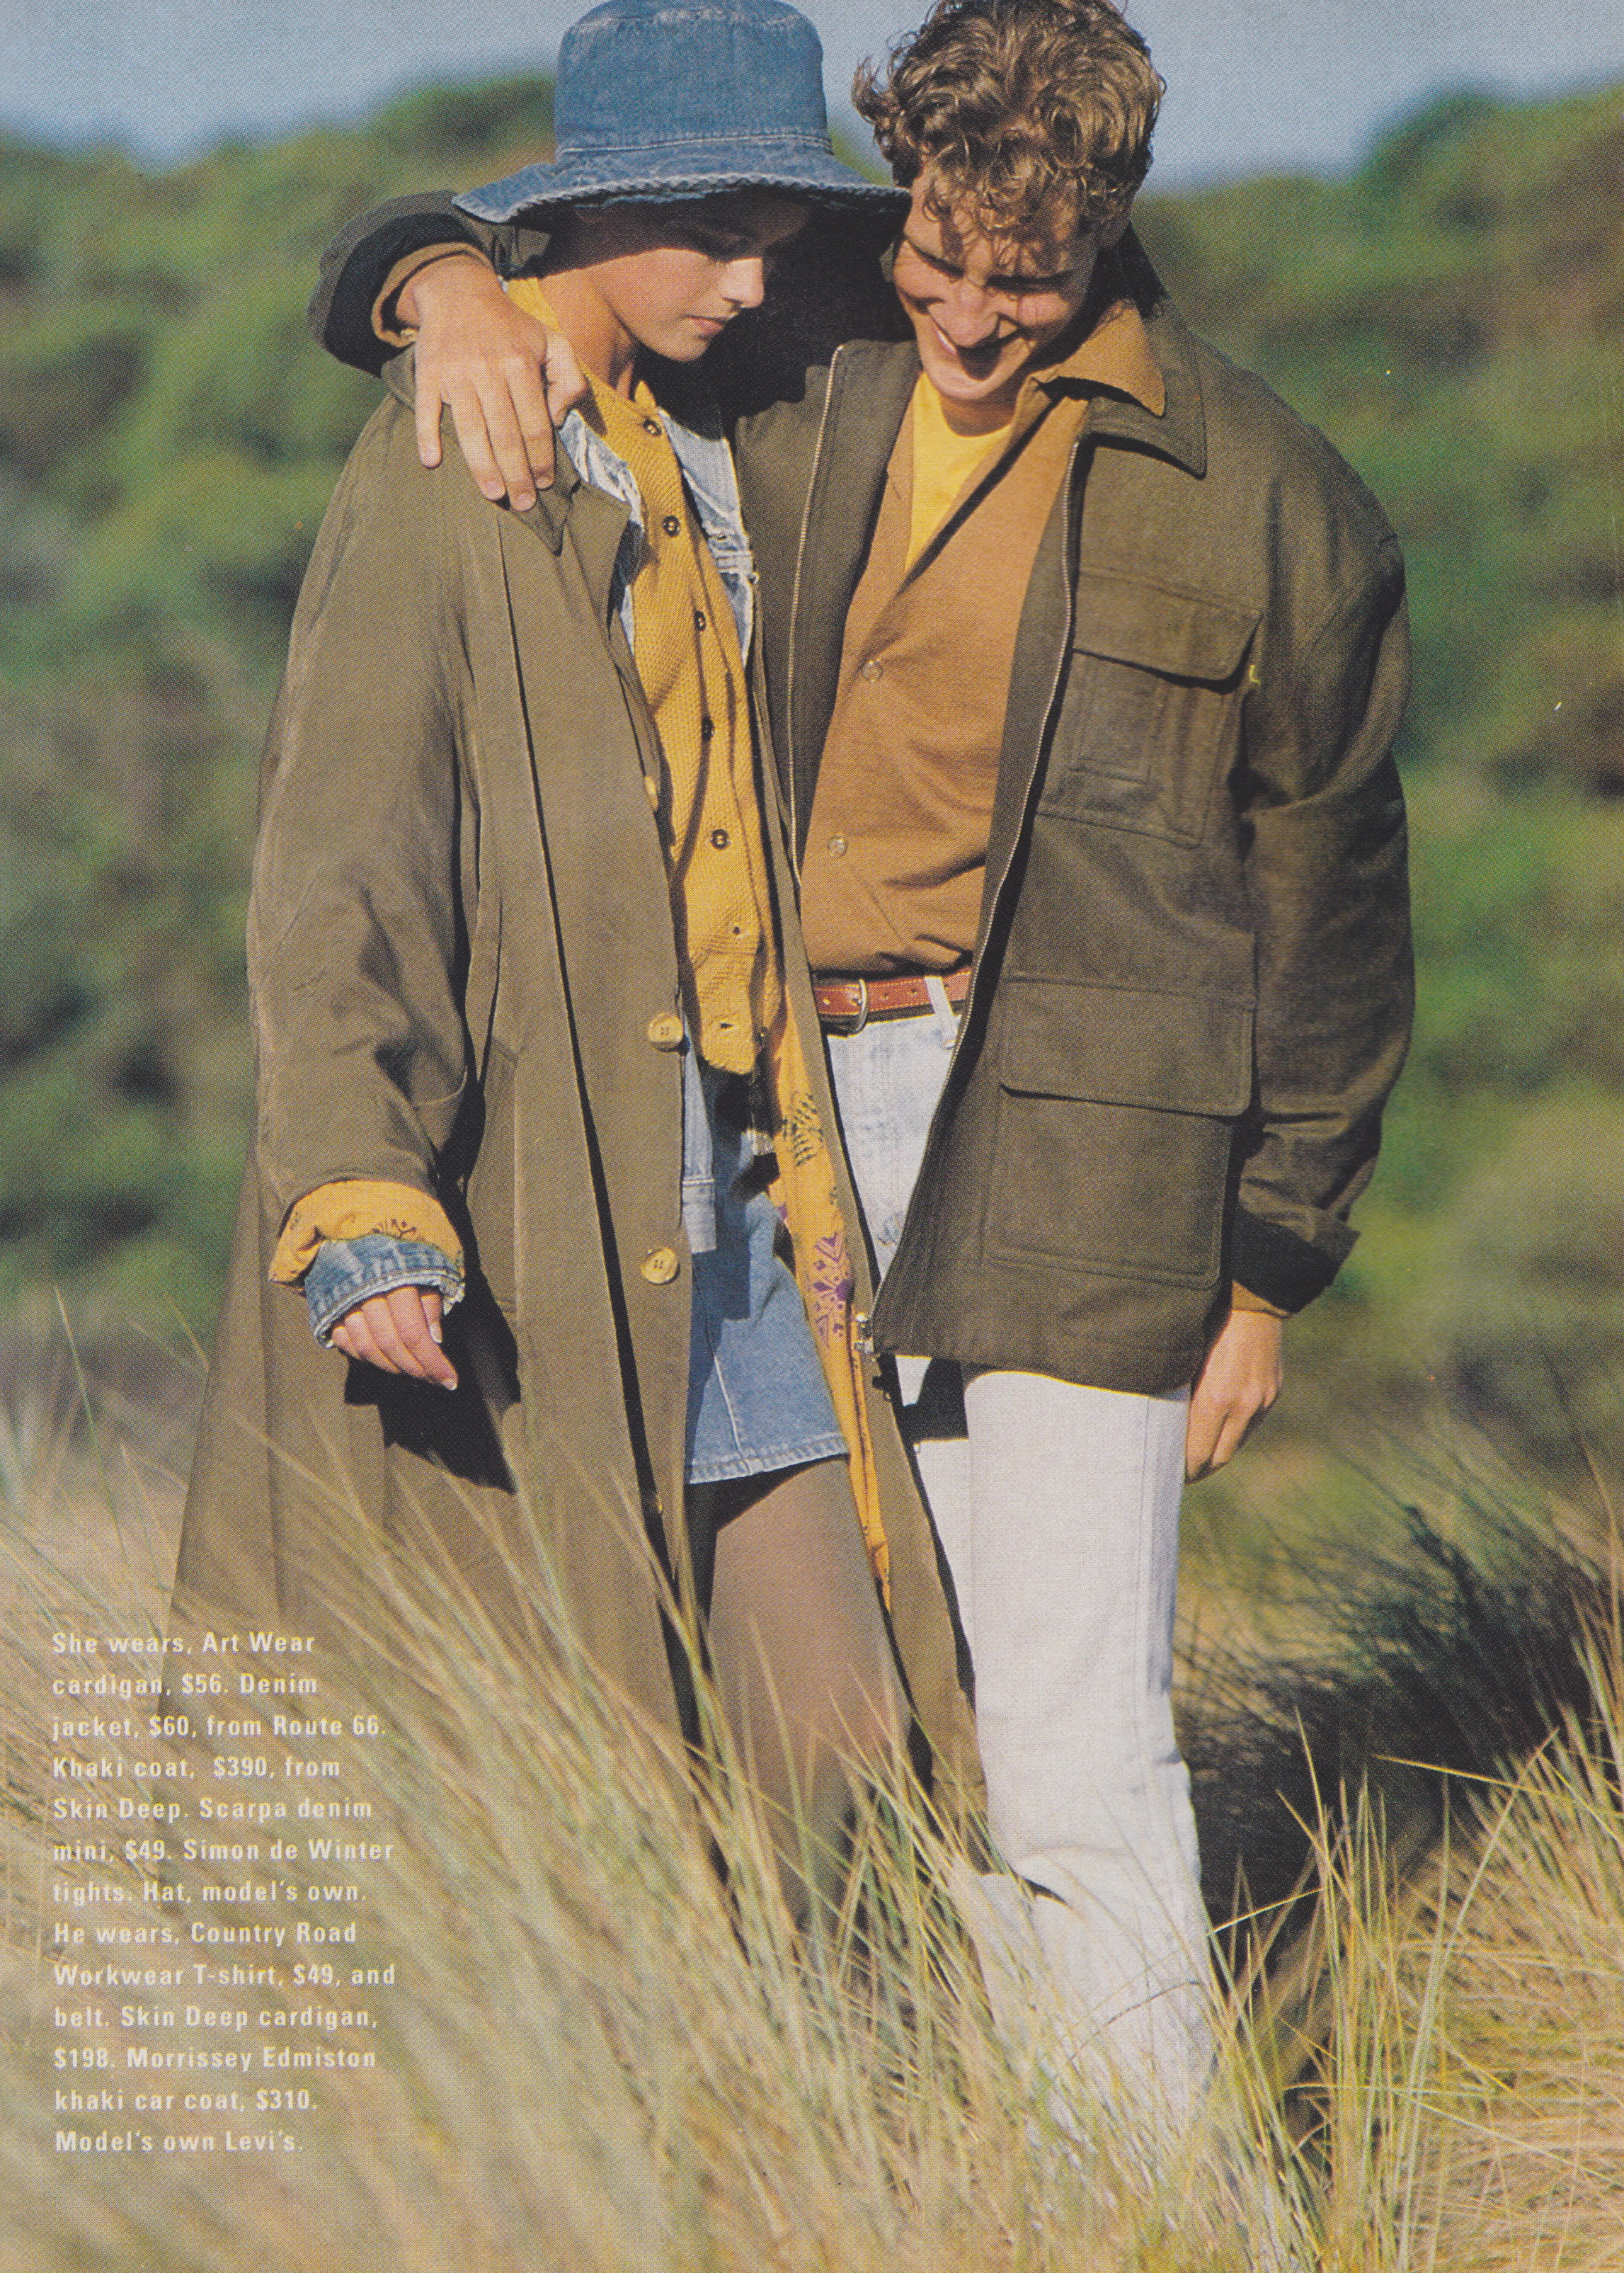 Cosmo June 1990 | International Style 08.jpeg